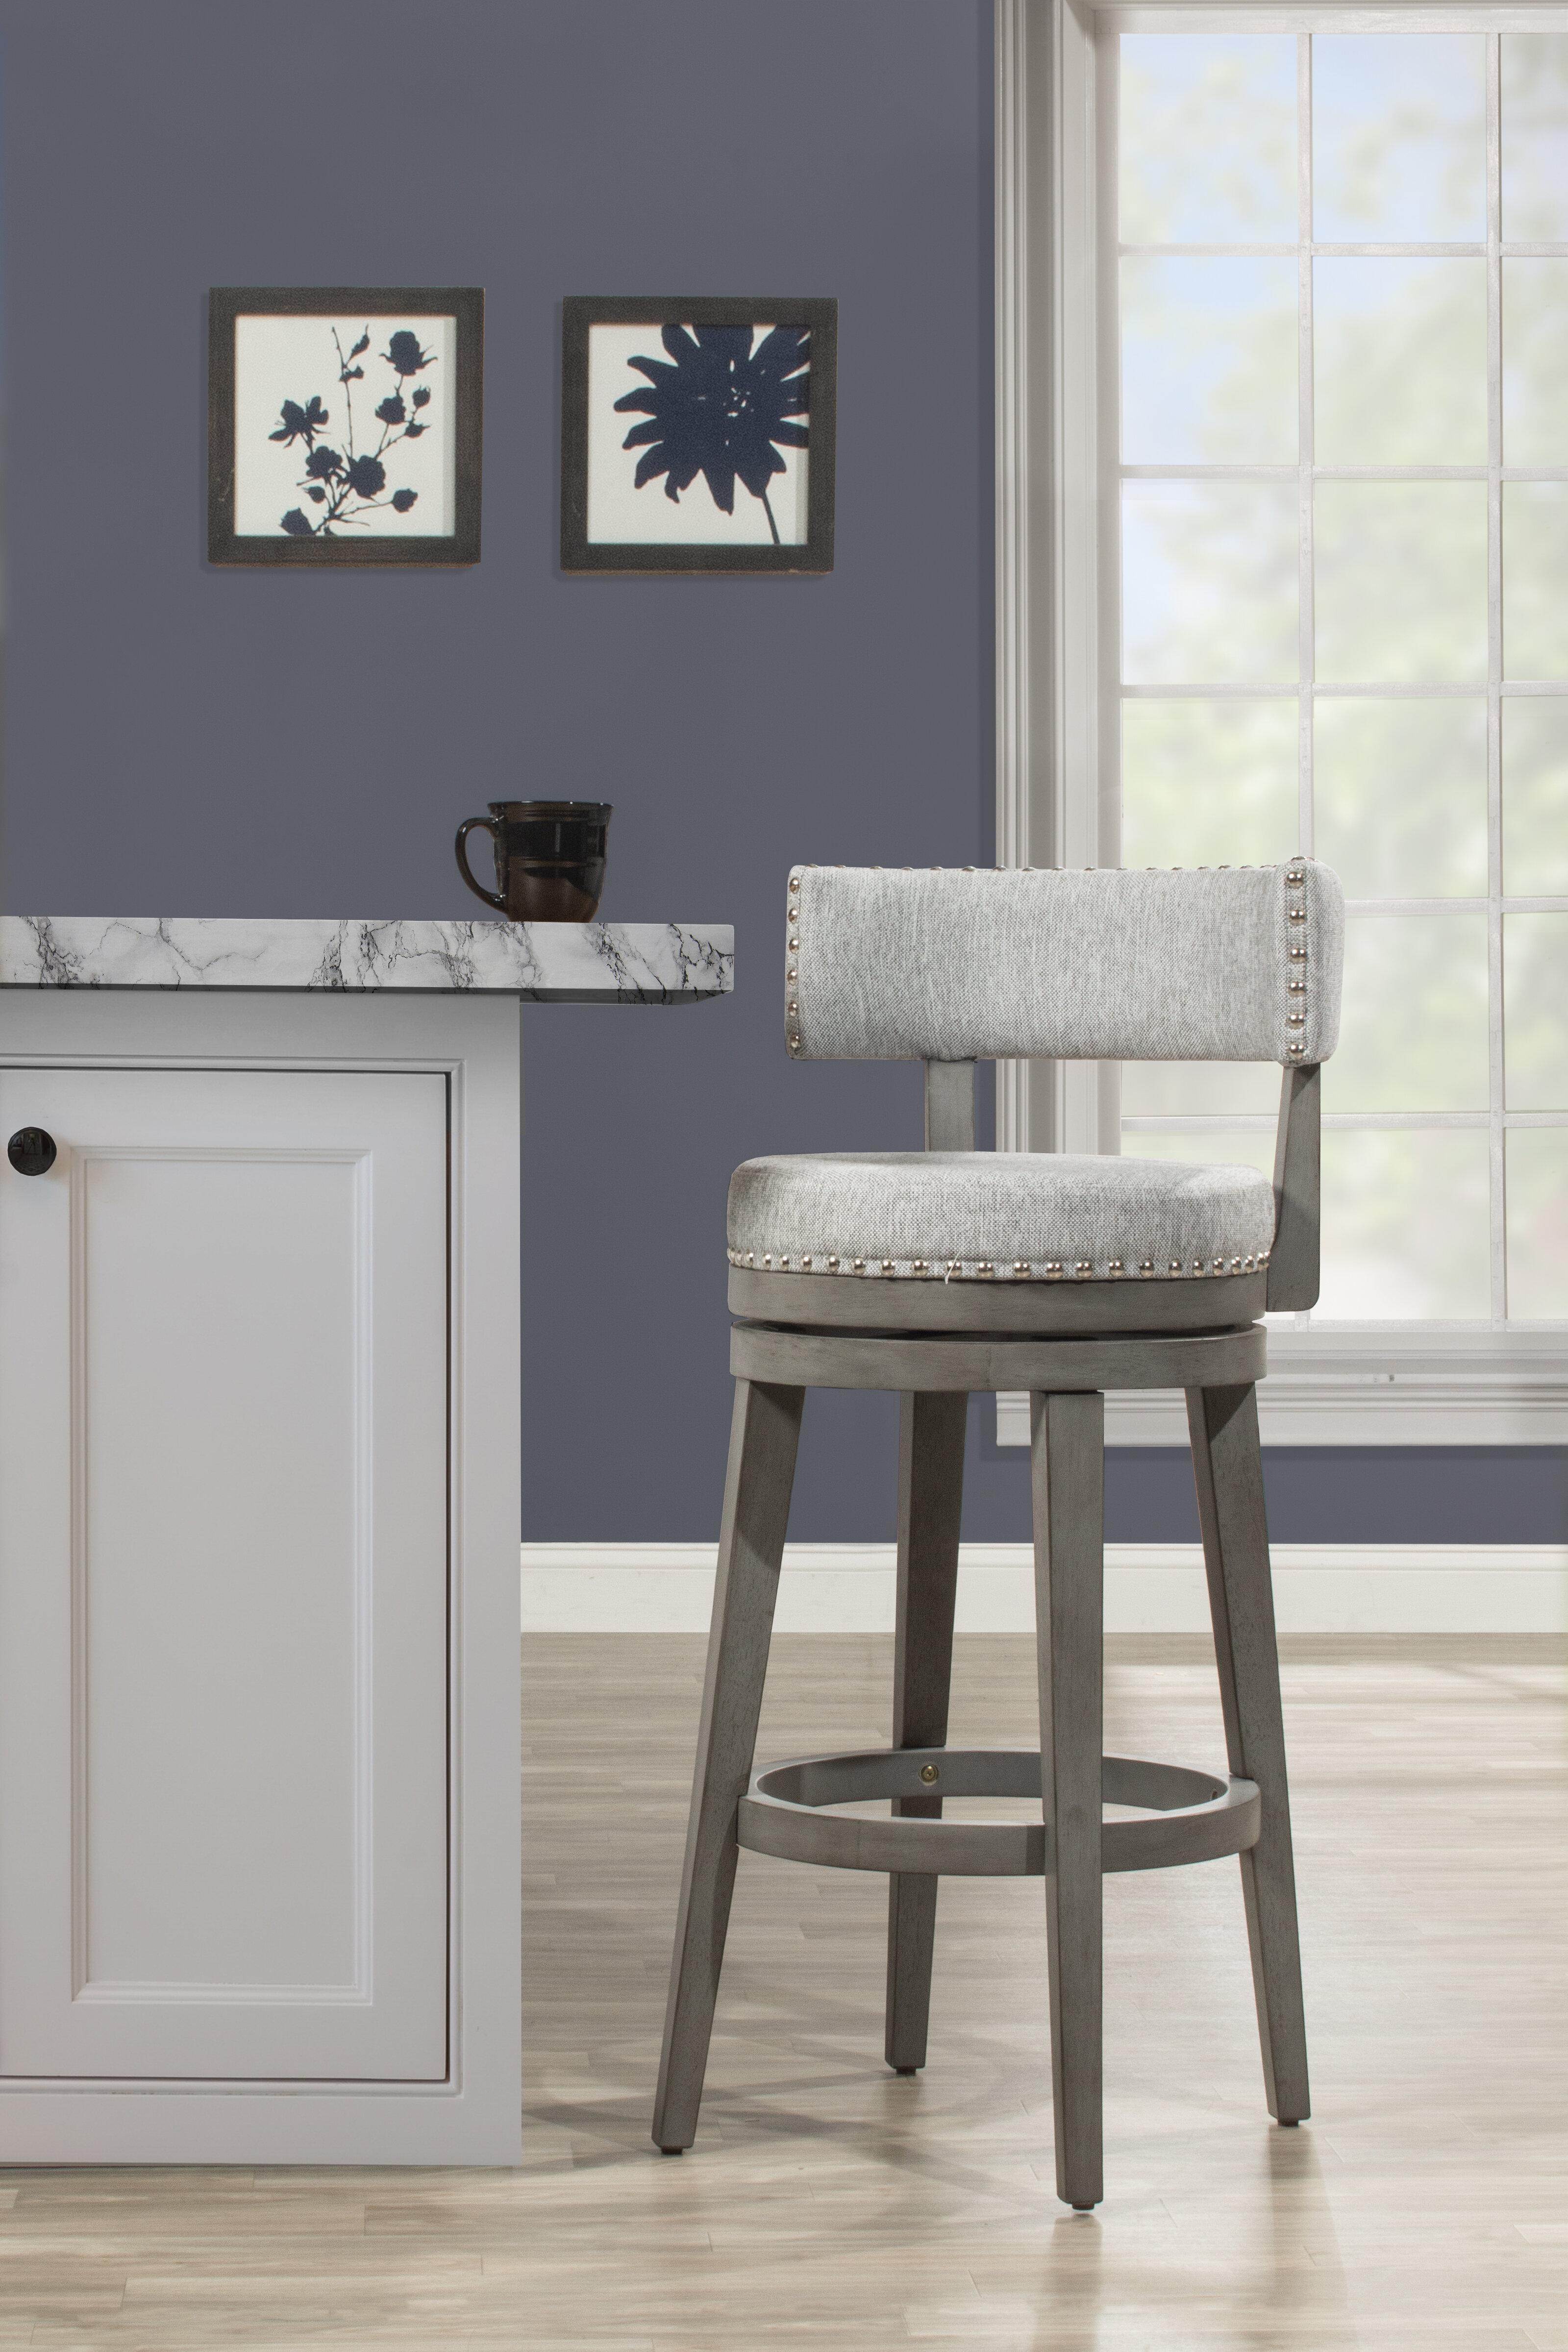 Swell Malachy Bar Counter Stool Swivel Stool Beatyapartments Chair Design Images Beatyapartmentscom